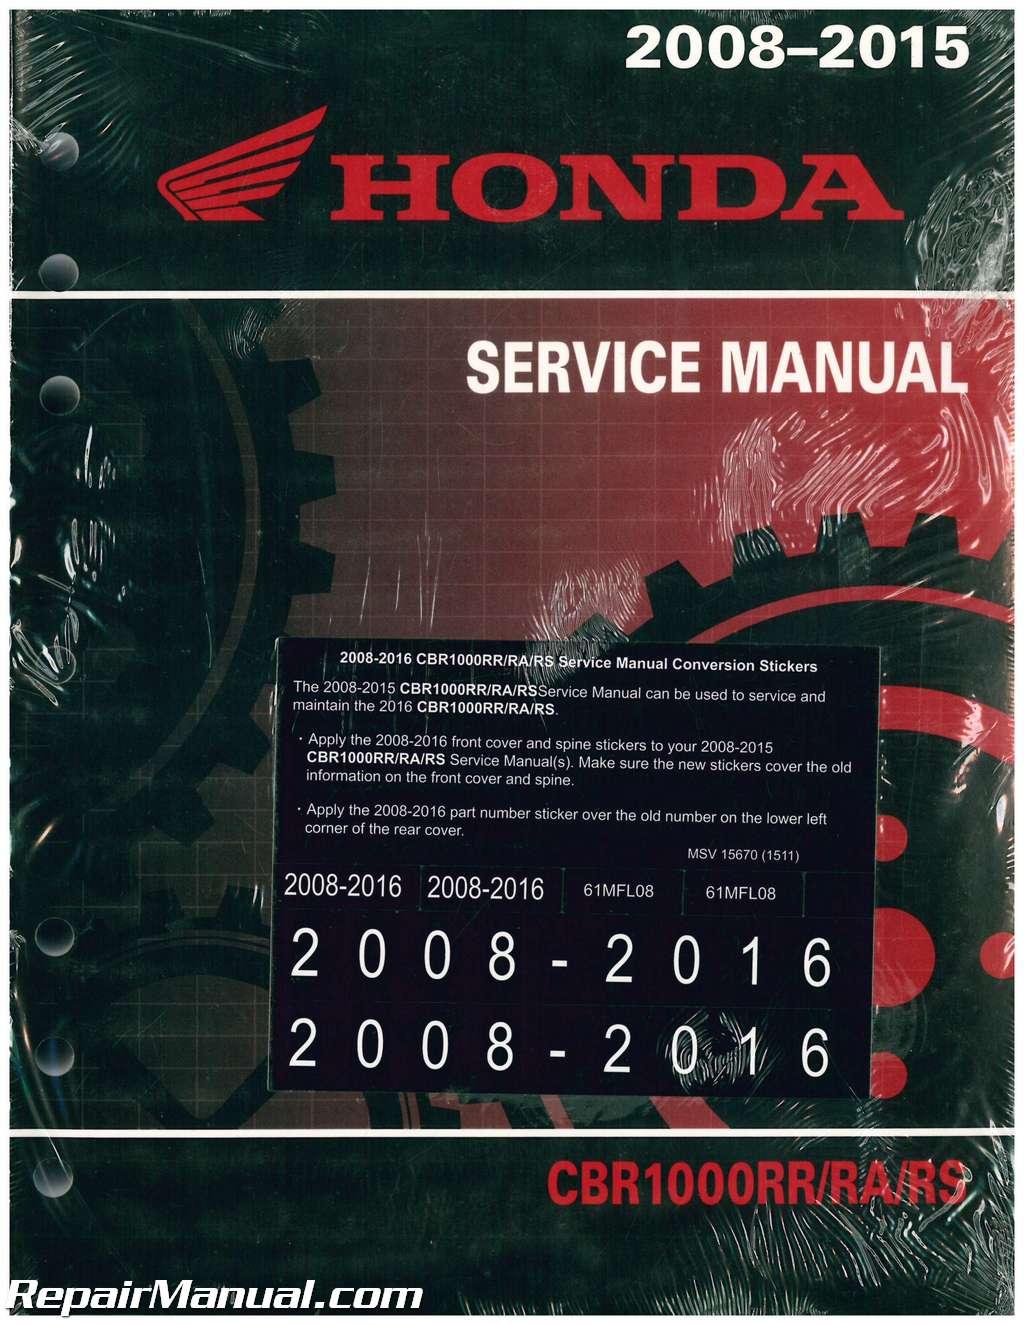 Honda Cbr1000Rr For Sale >> 2008-2016 Honda CBR1000RR Motorcycle Service Manual